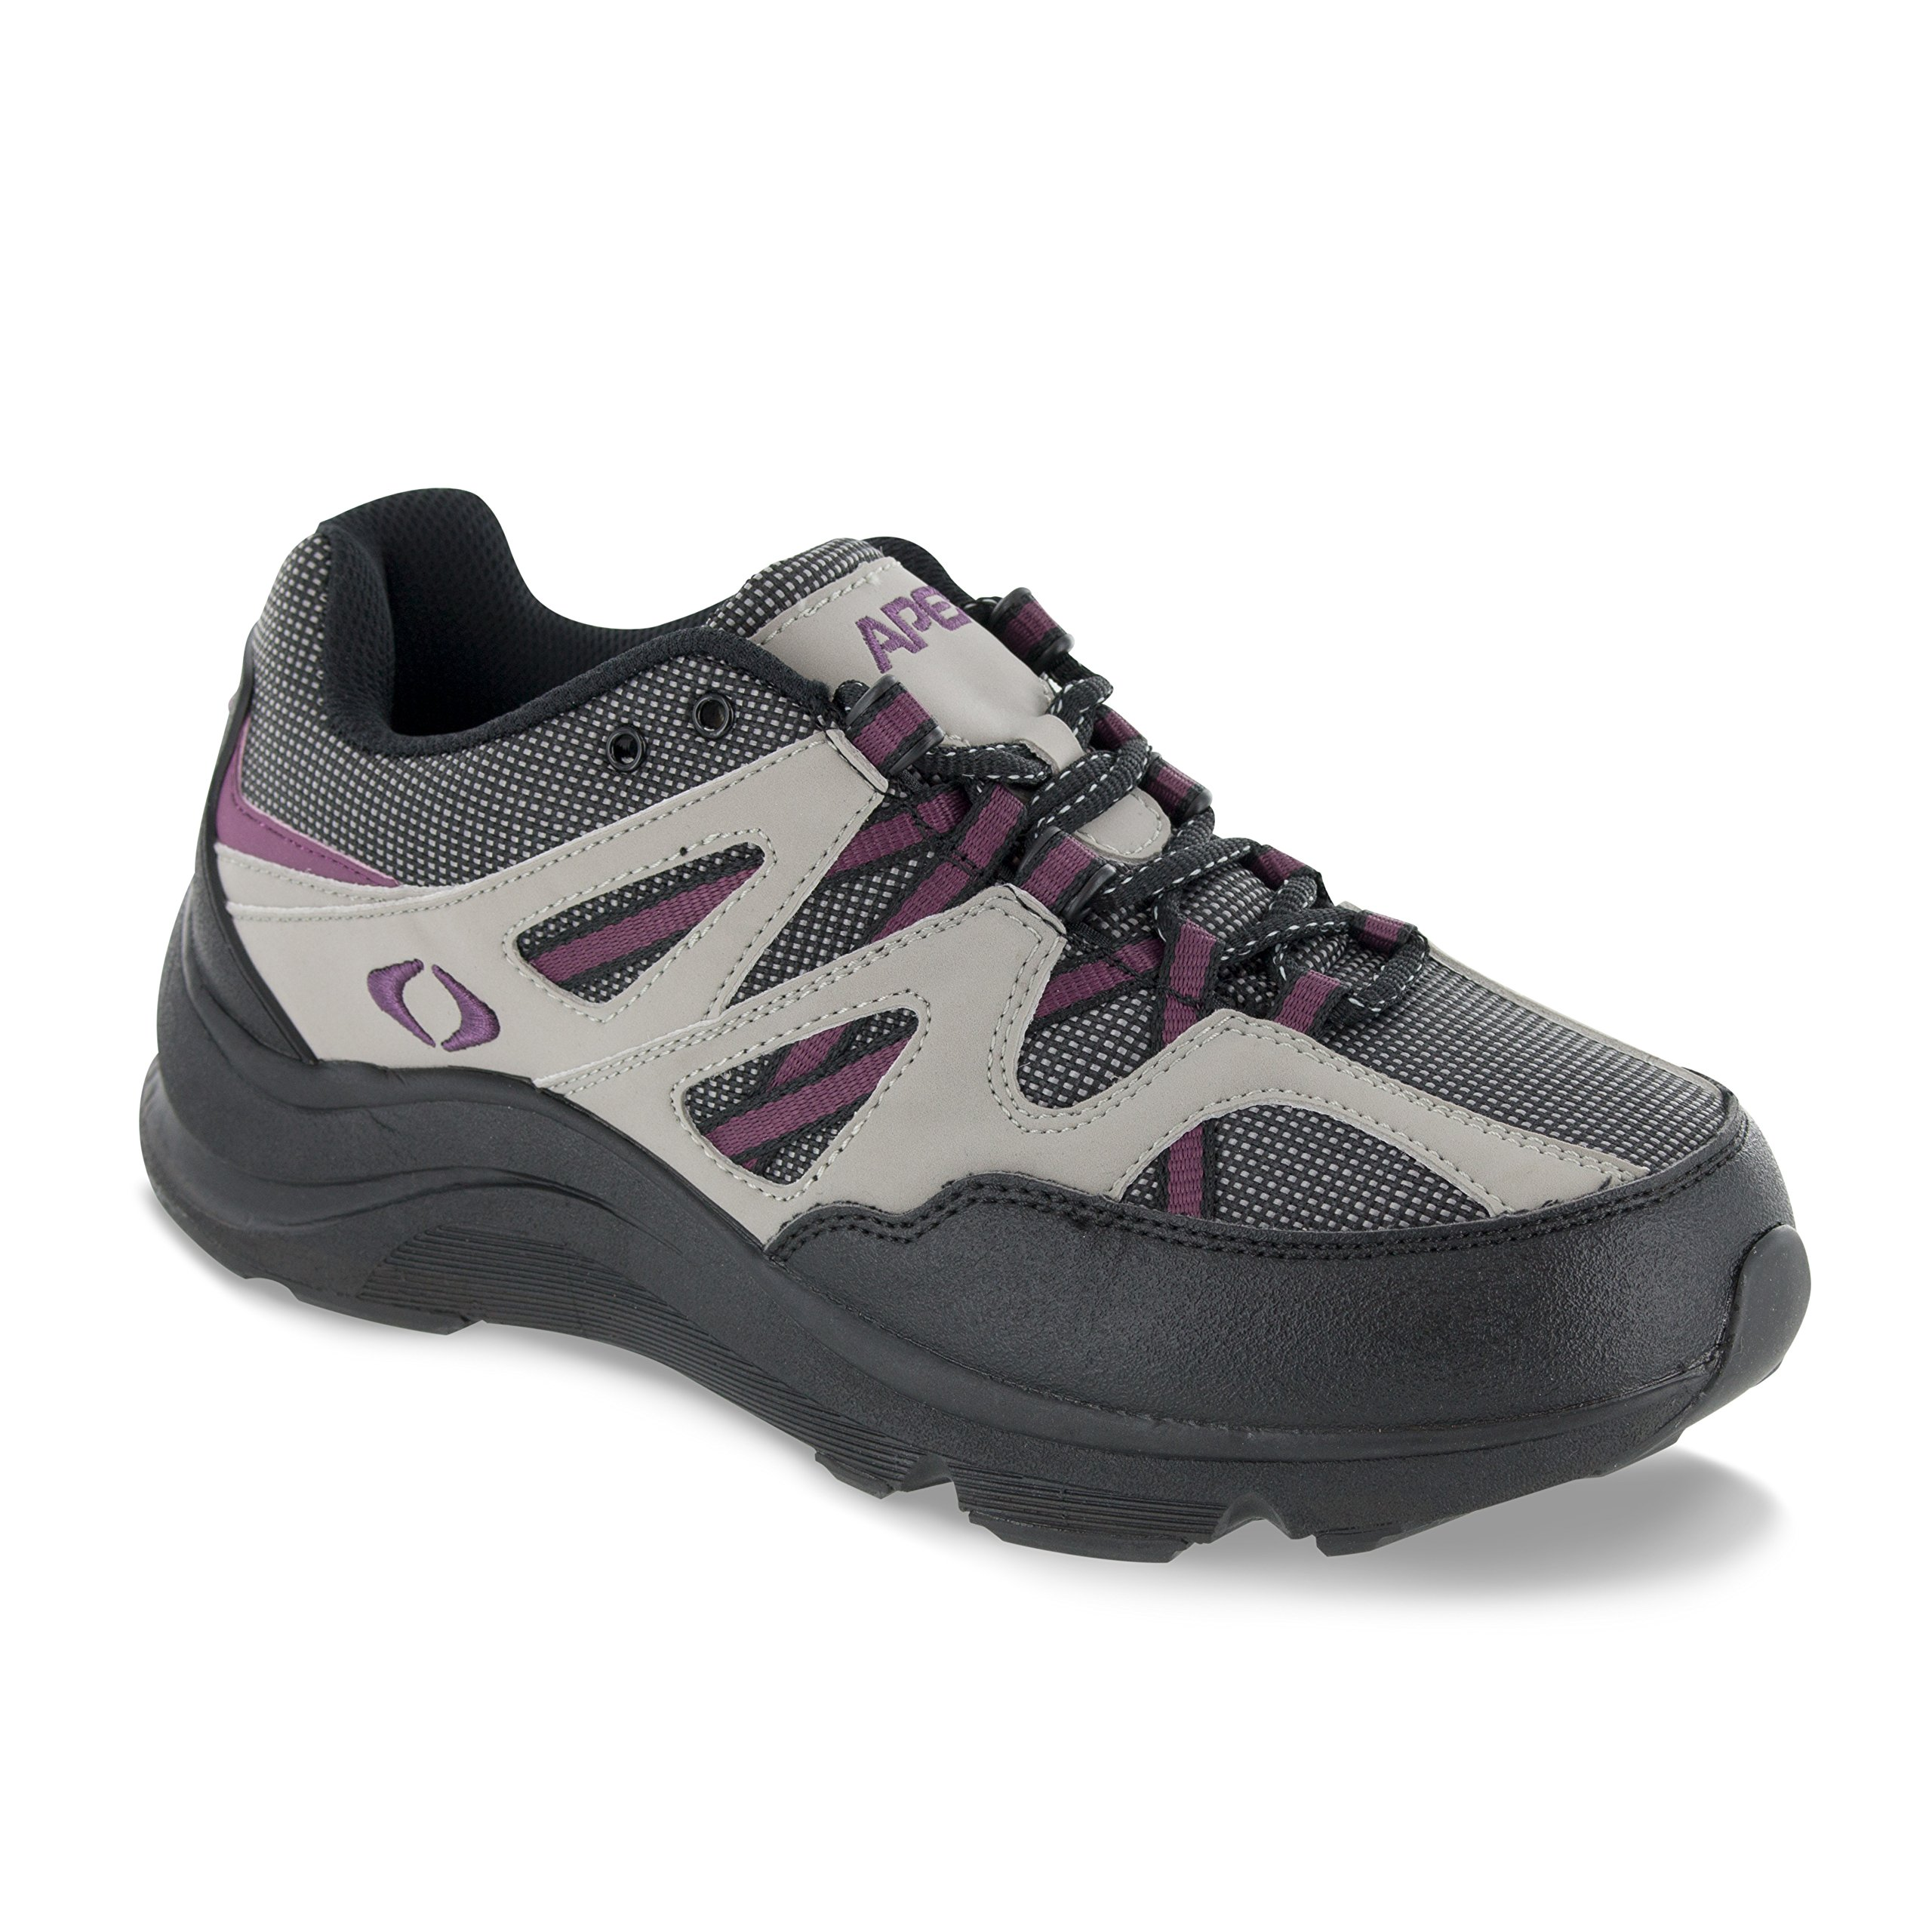 Apex Women's Sierra Trail Runner Hiking Shoe Sneaker, Grey/Purple, 9.5 Extra Wide US by Apex